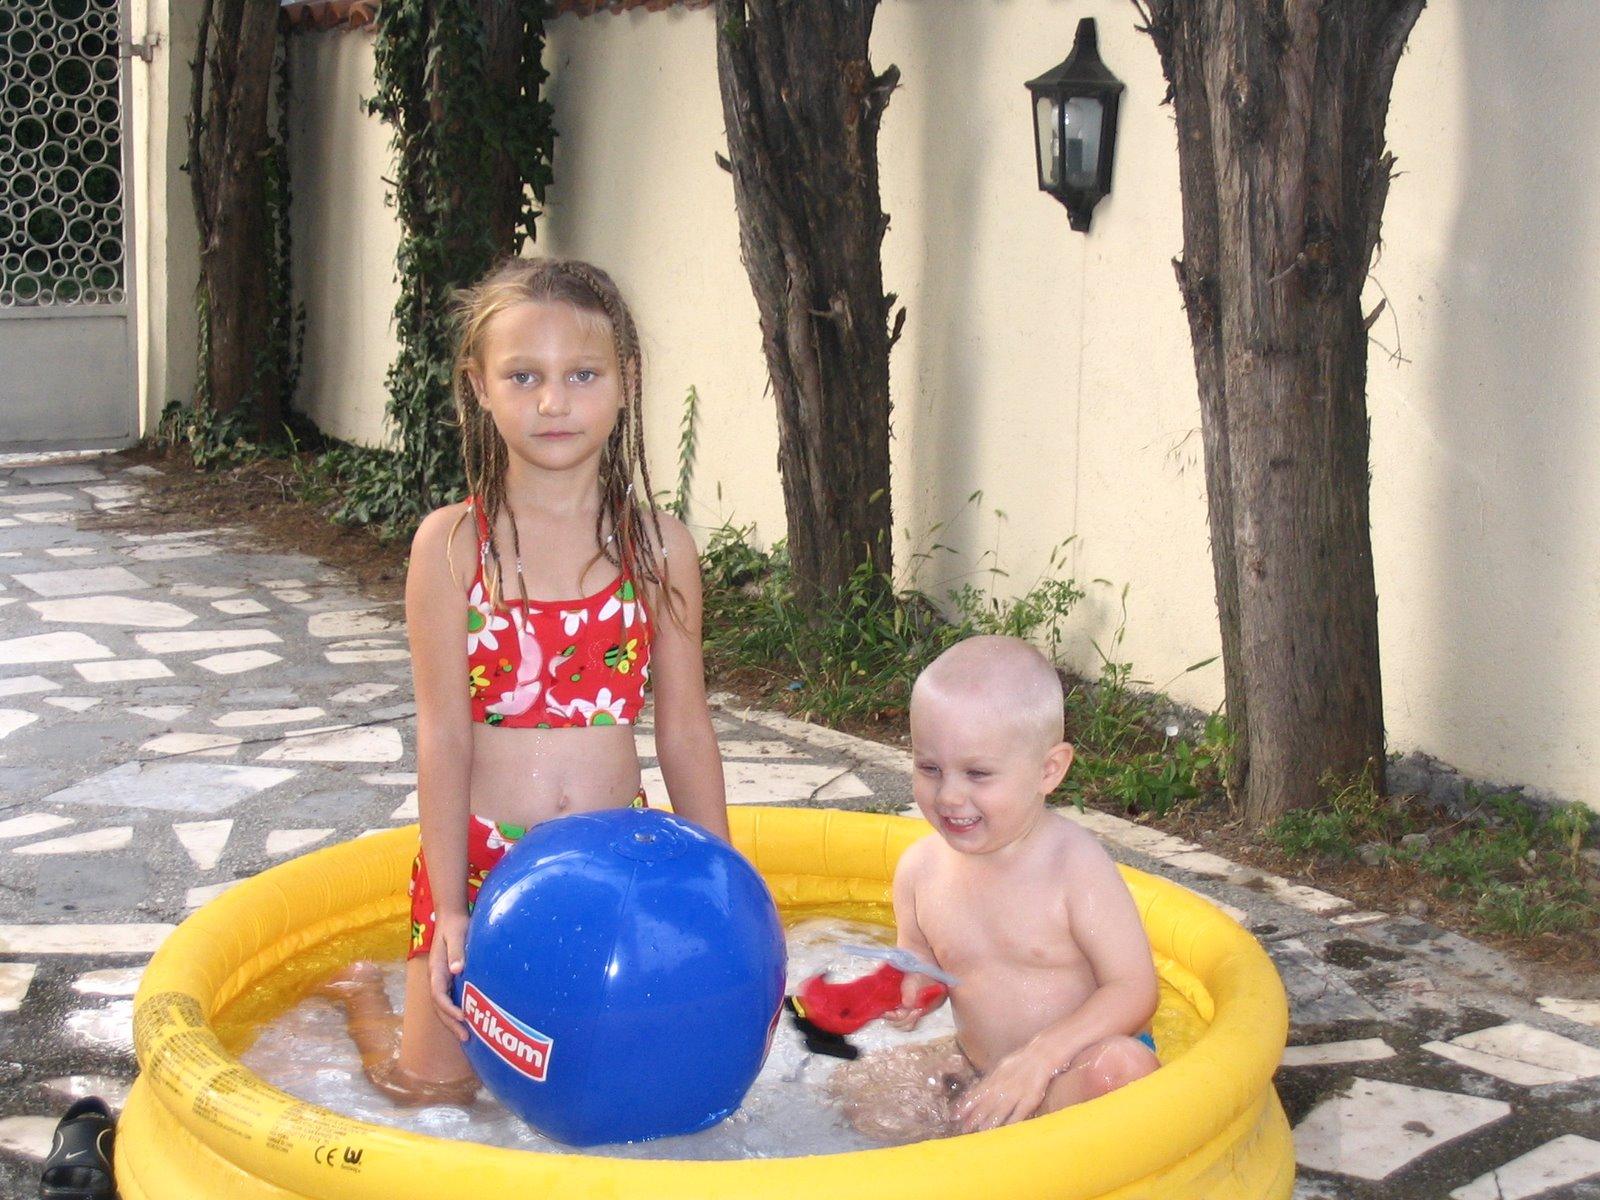 [Macedonia+Summer+]